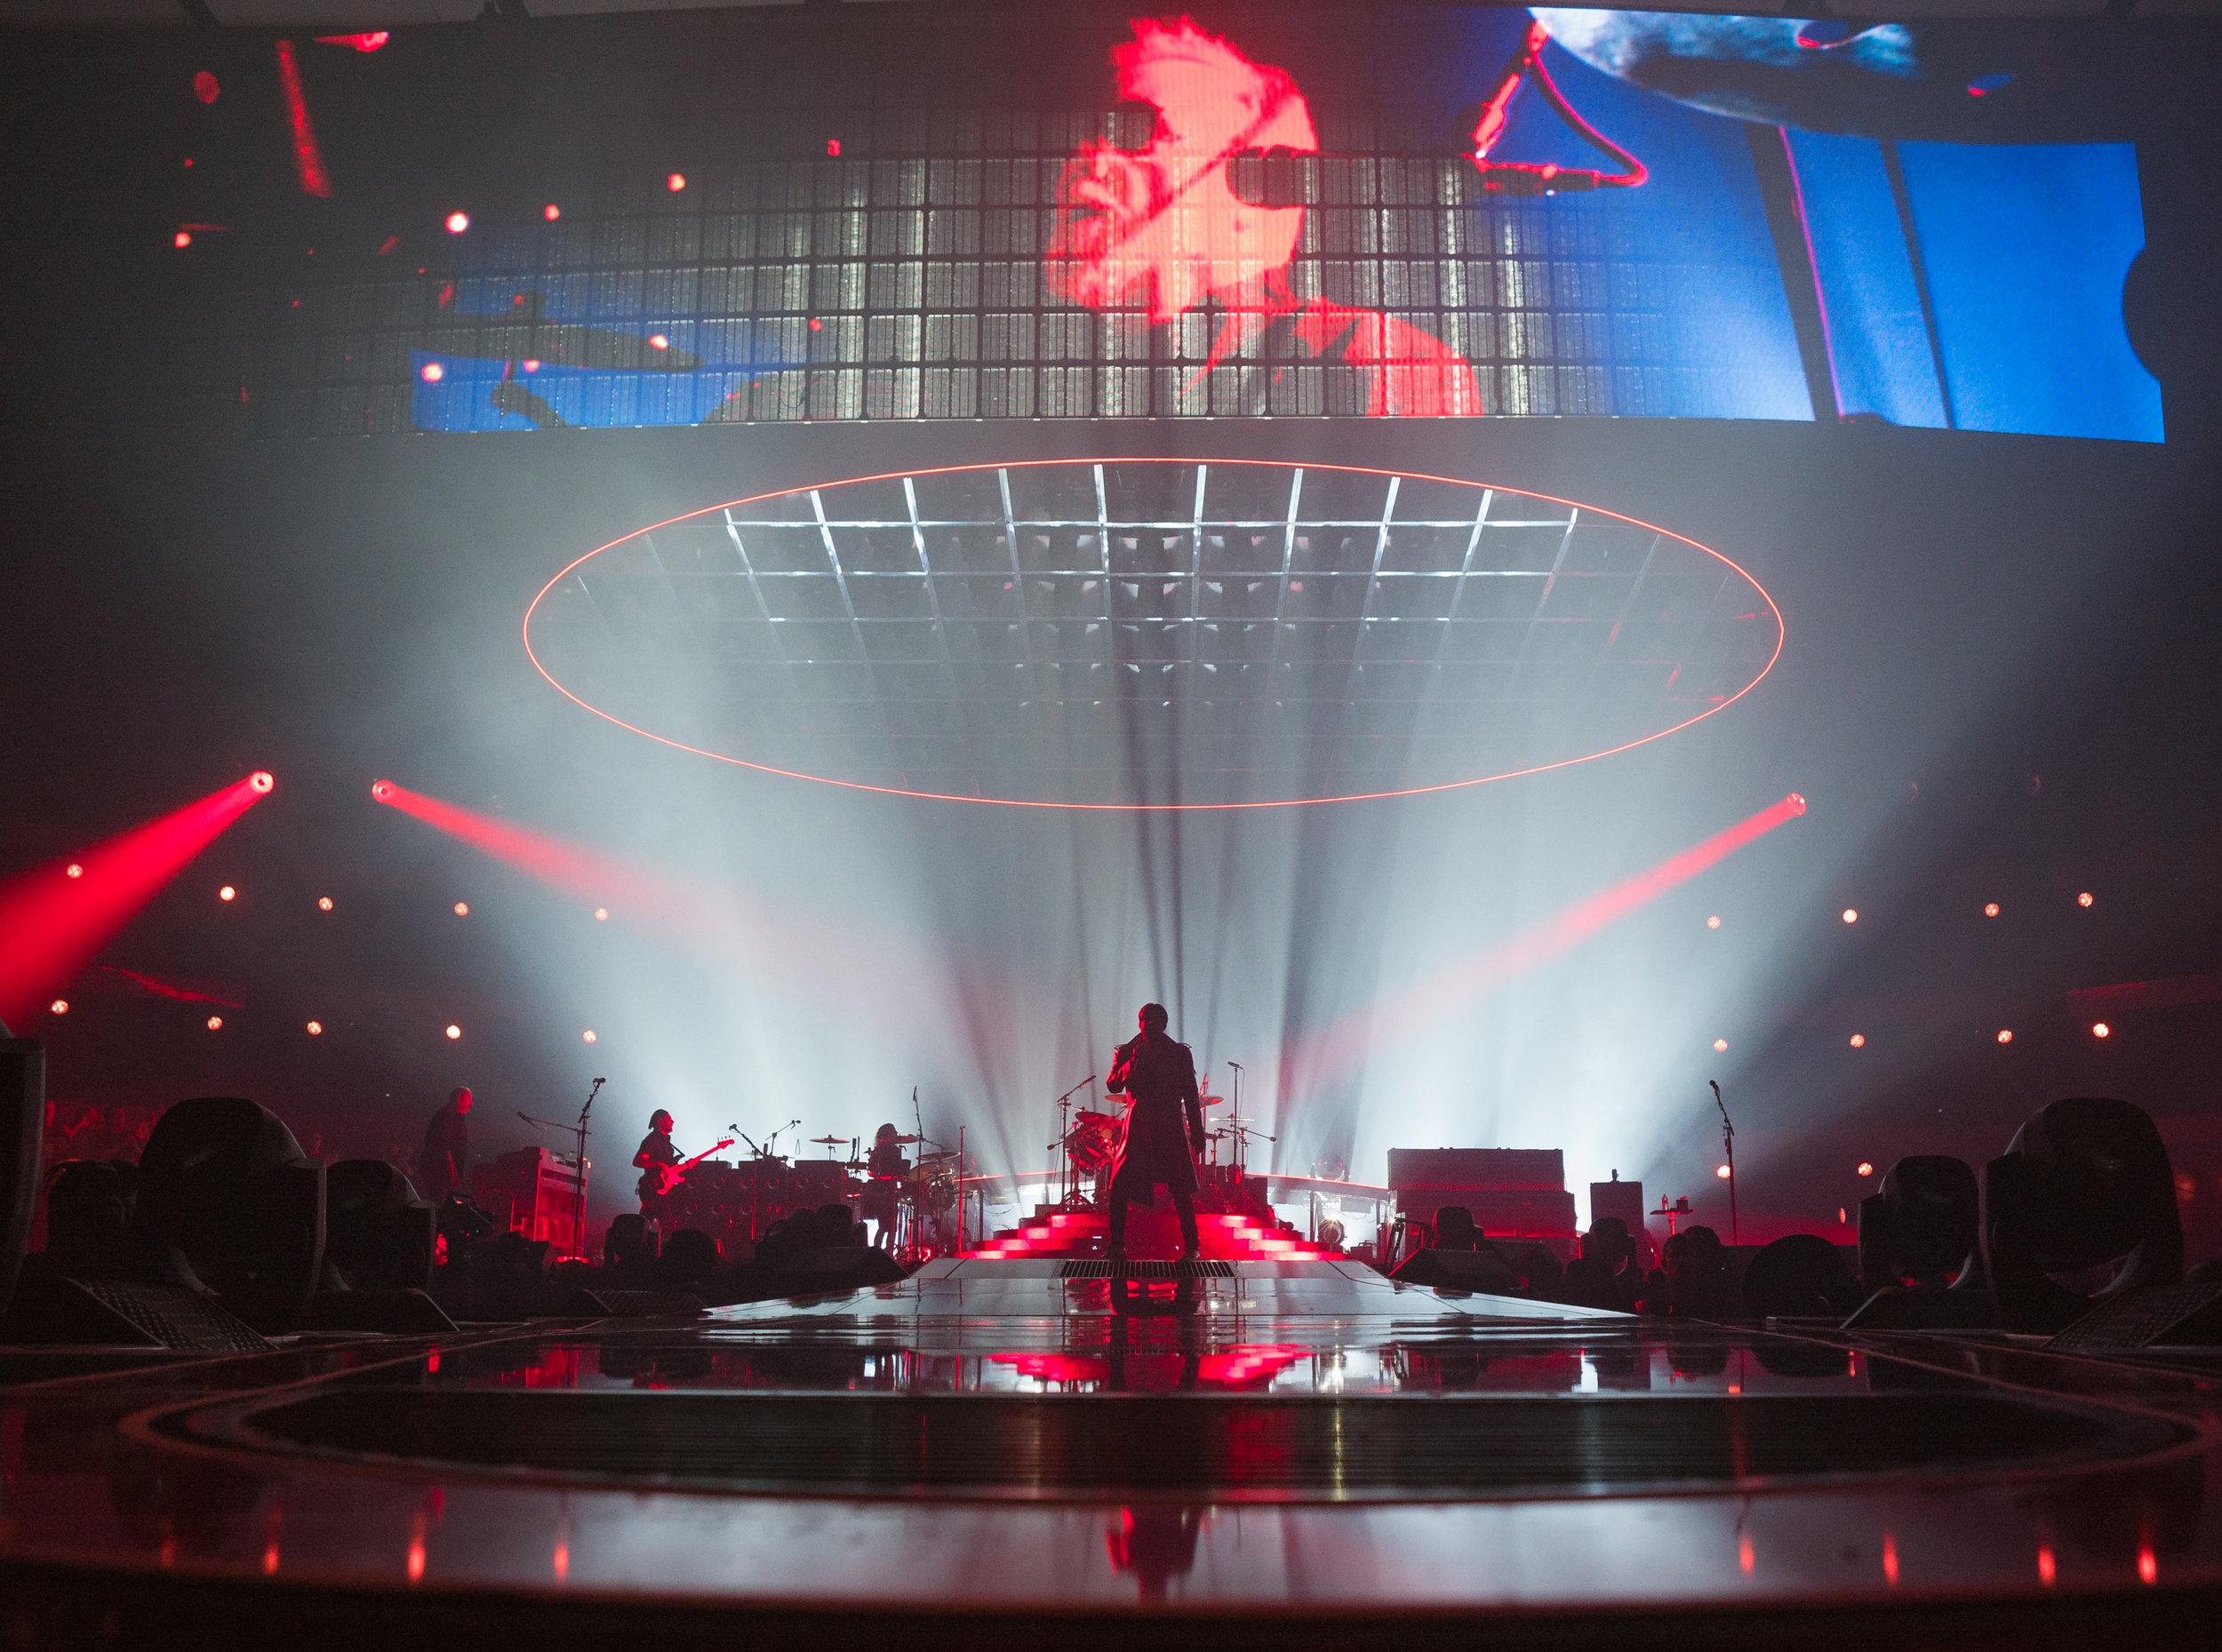 Queen + Adam Lambert at Las Vegas, 2018